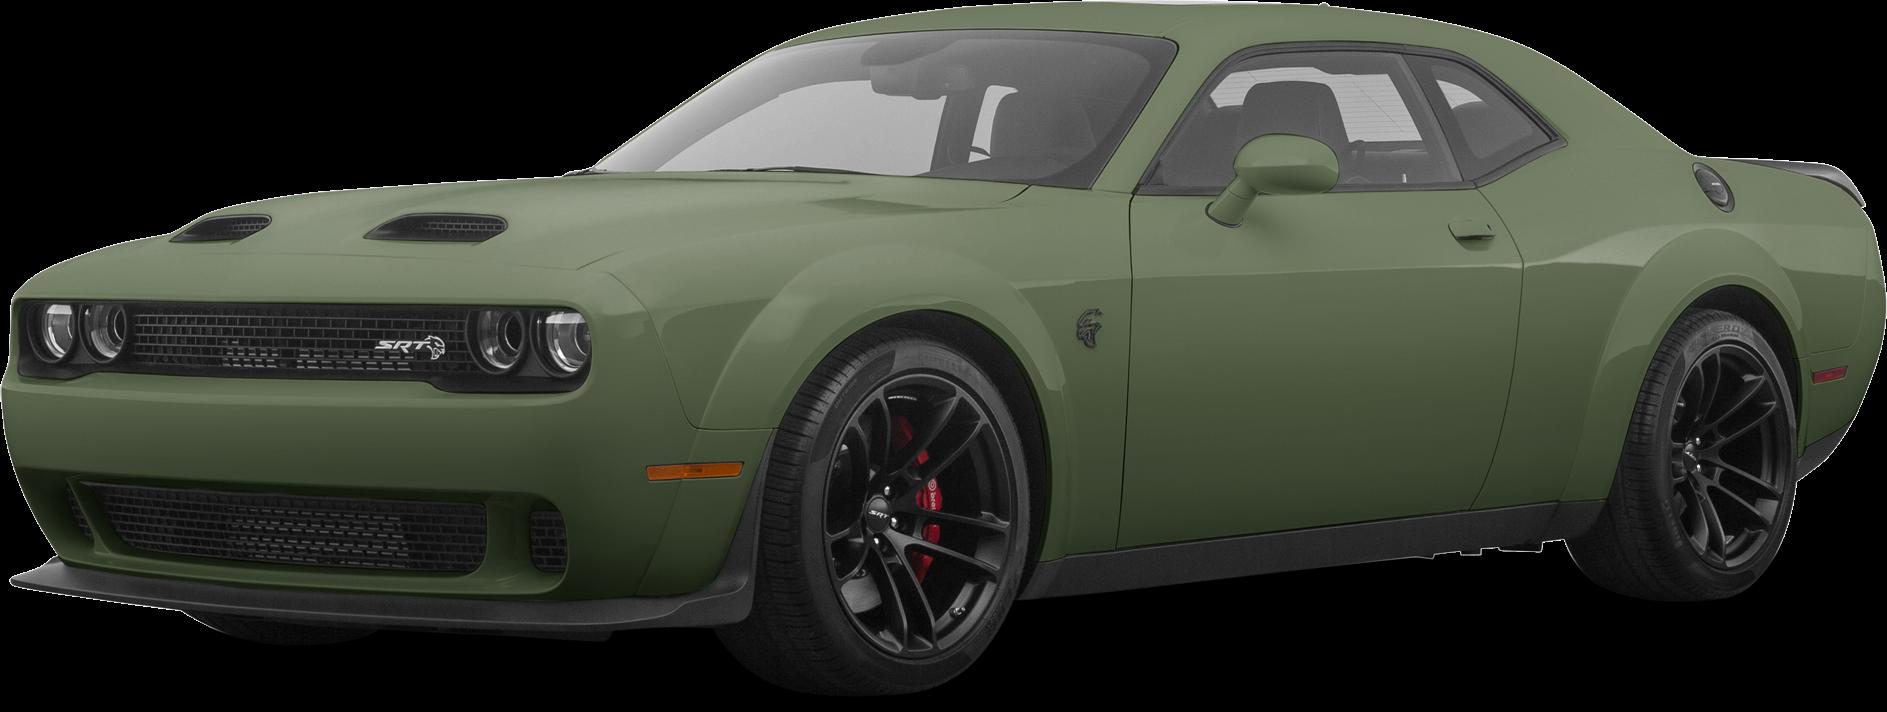 dodge hellcat kelley blue book New 2 Dodge Challenger SRT Hellcat Prices  Kelley Blue Book